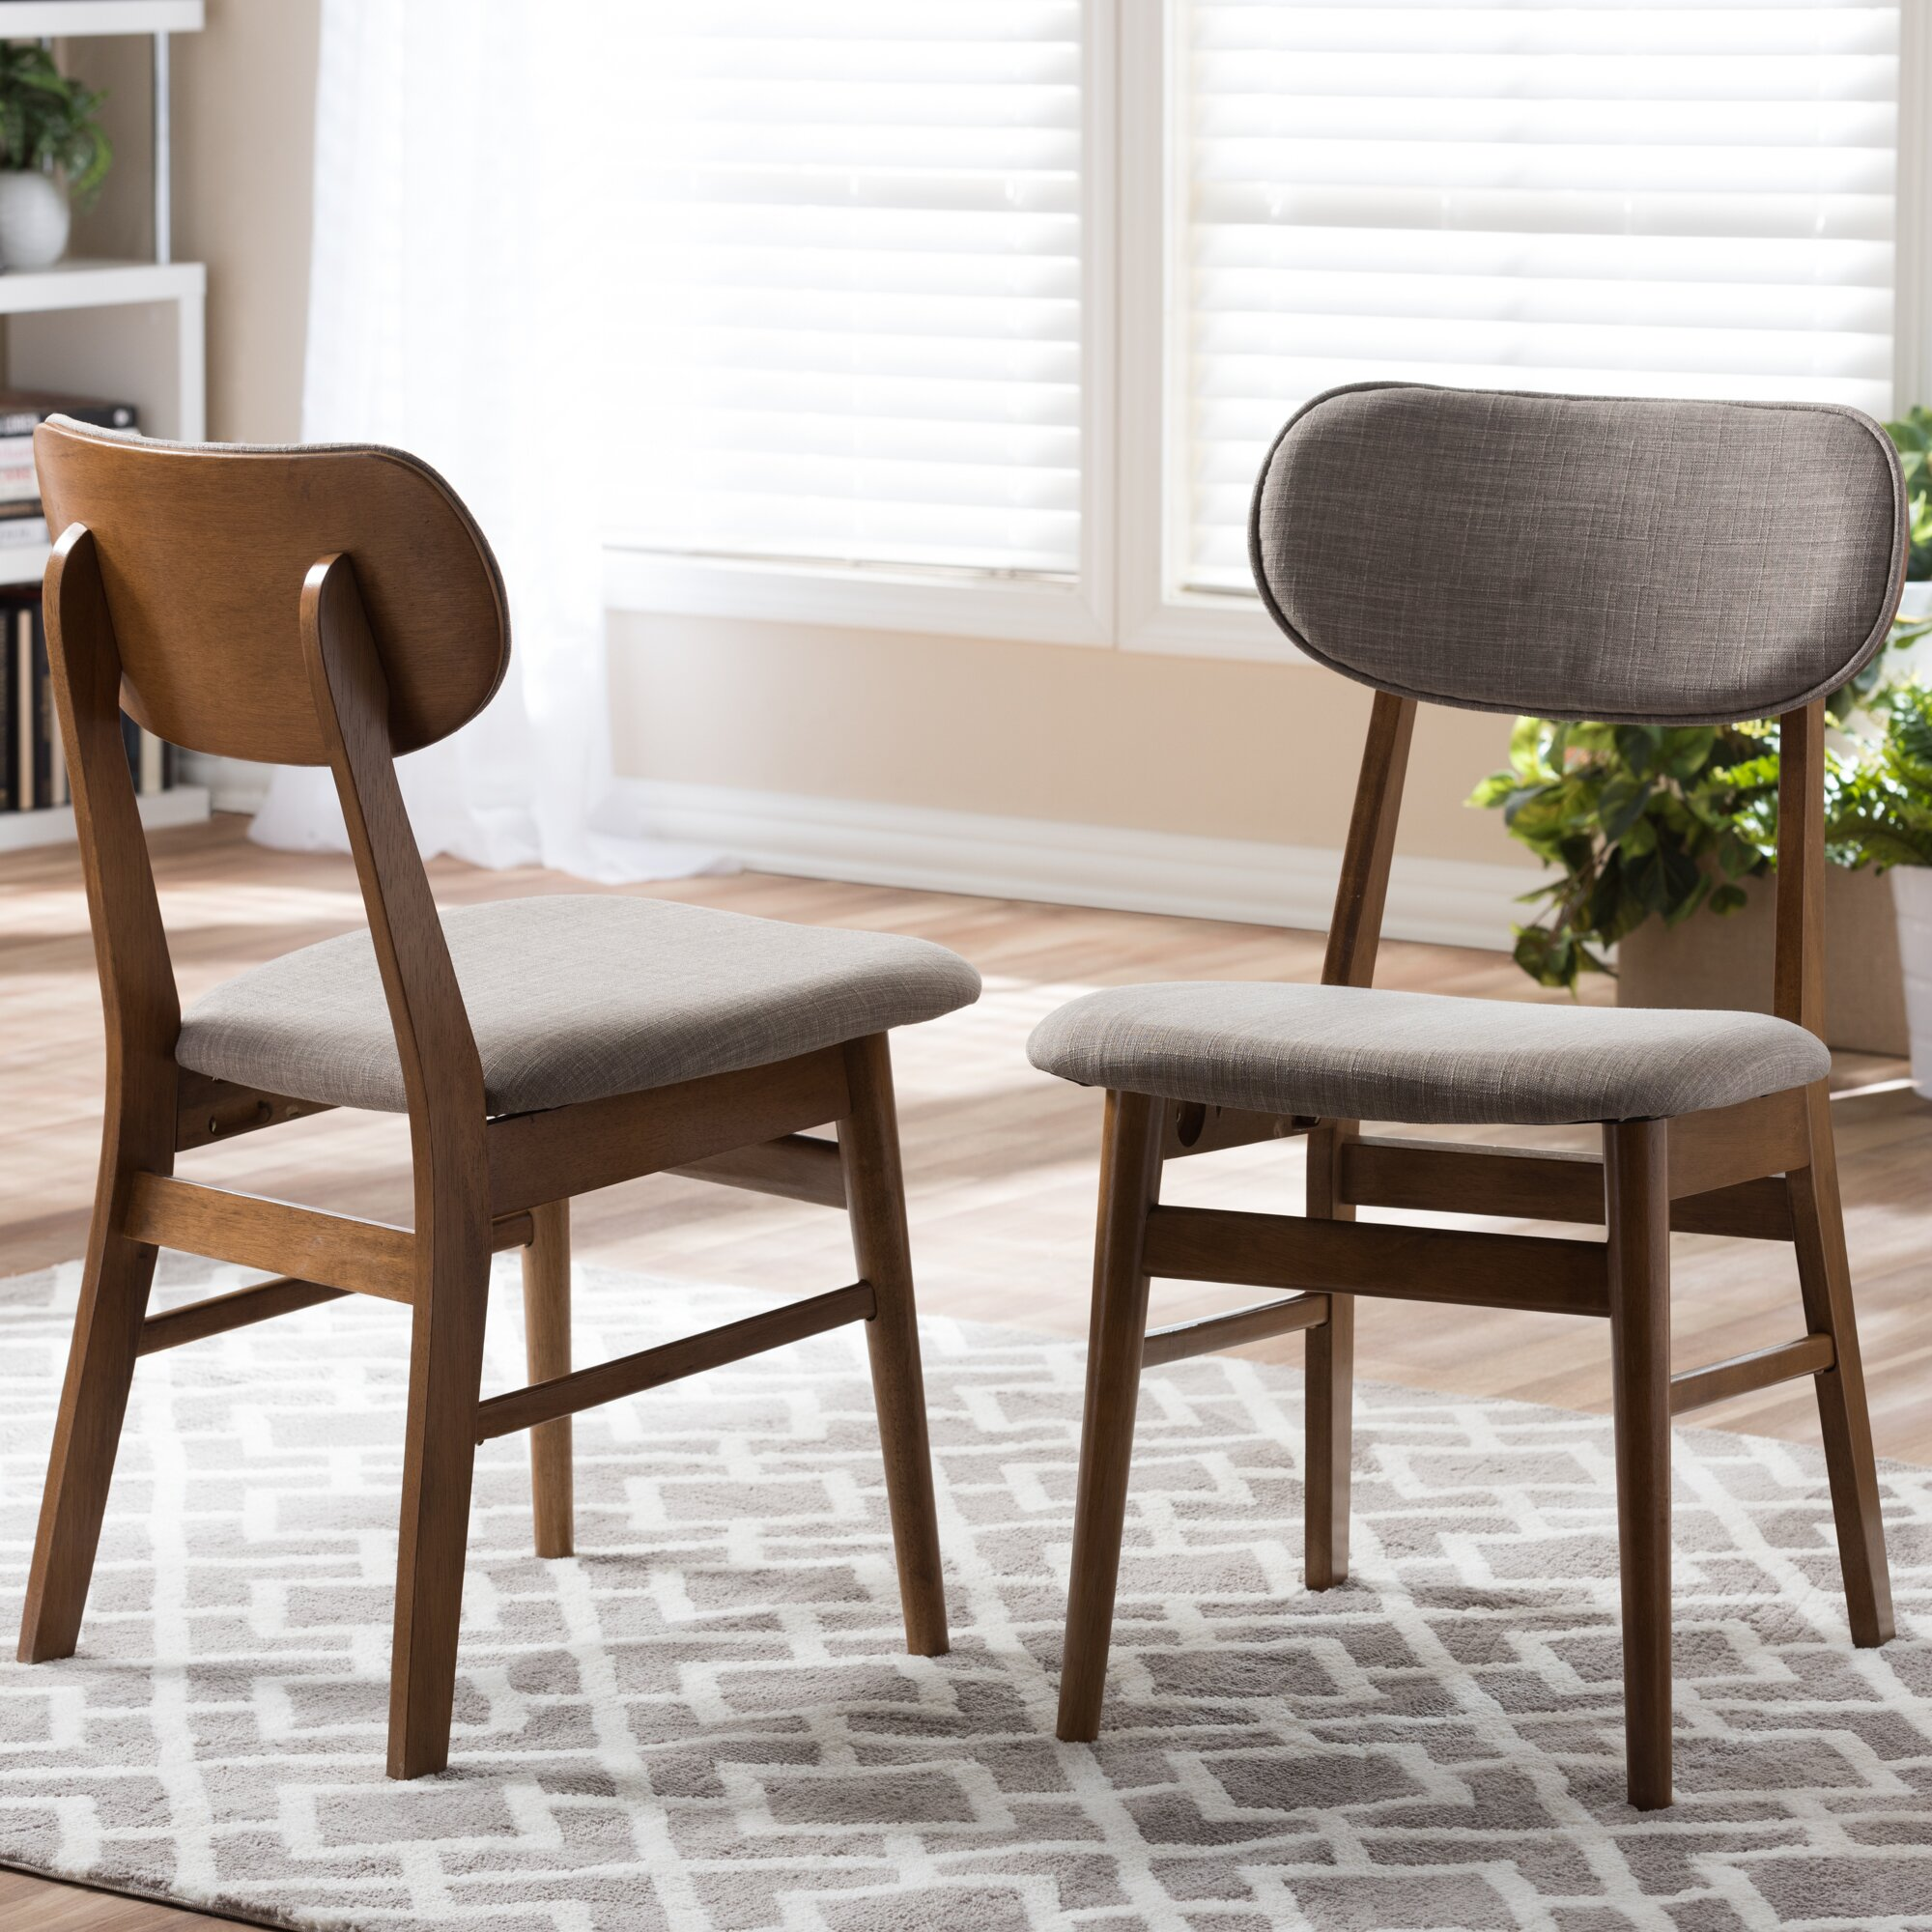 Cheap Wood Dining Chairs: Wholesale Interiors Baxton Studio Sacramento Side Chair